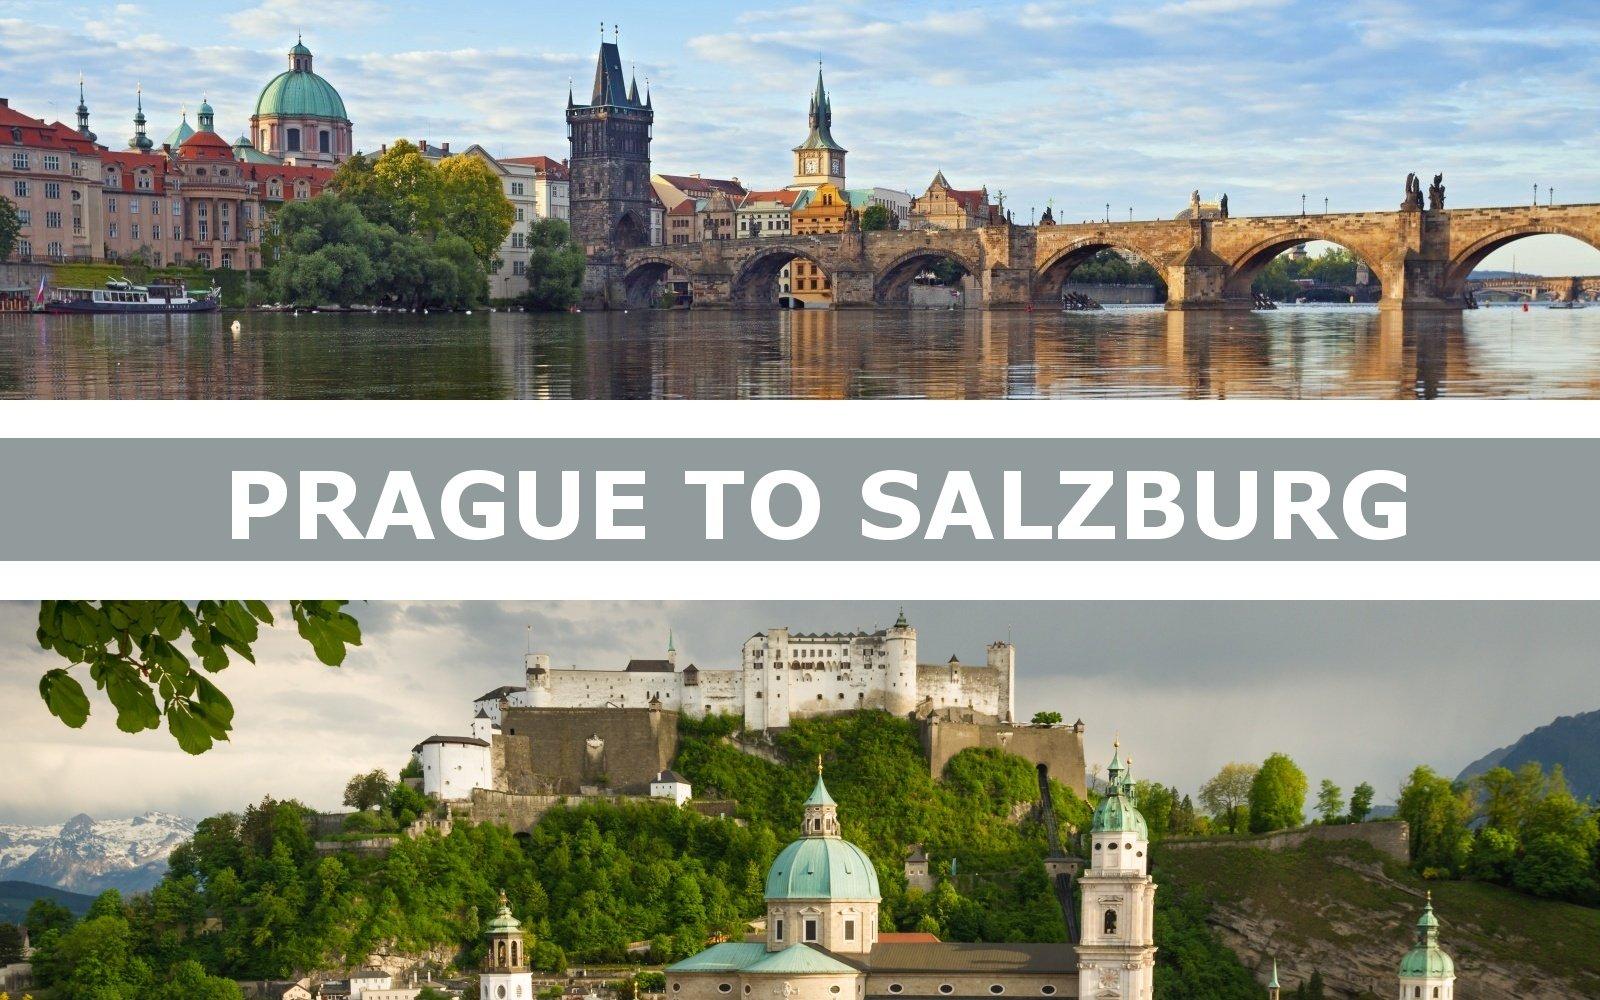 Transportation from Prague to Salzburg